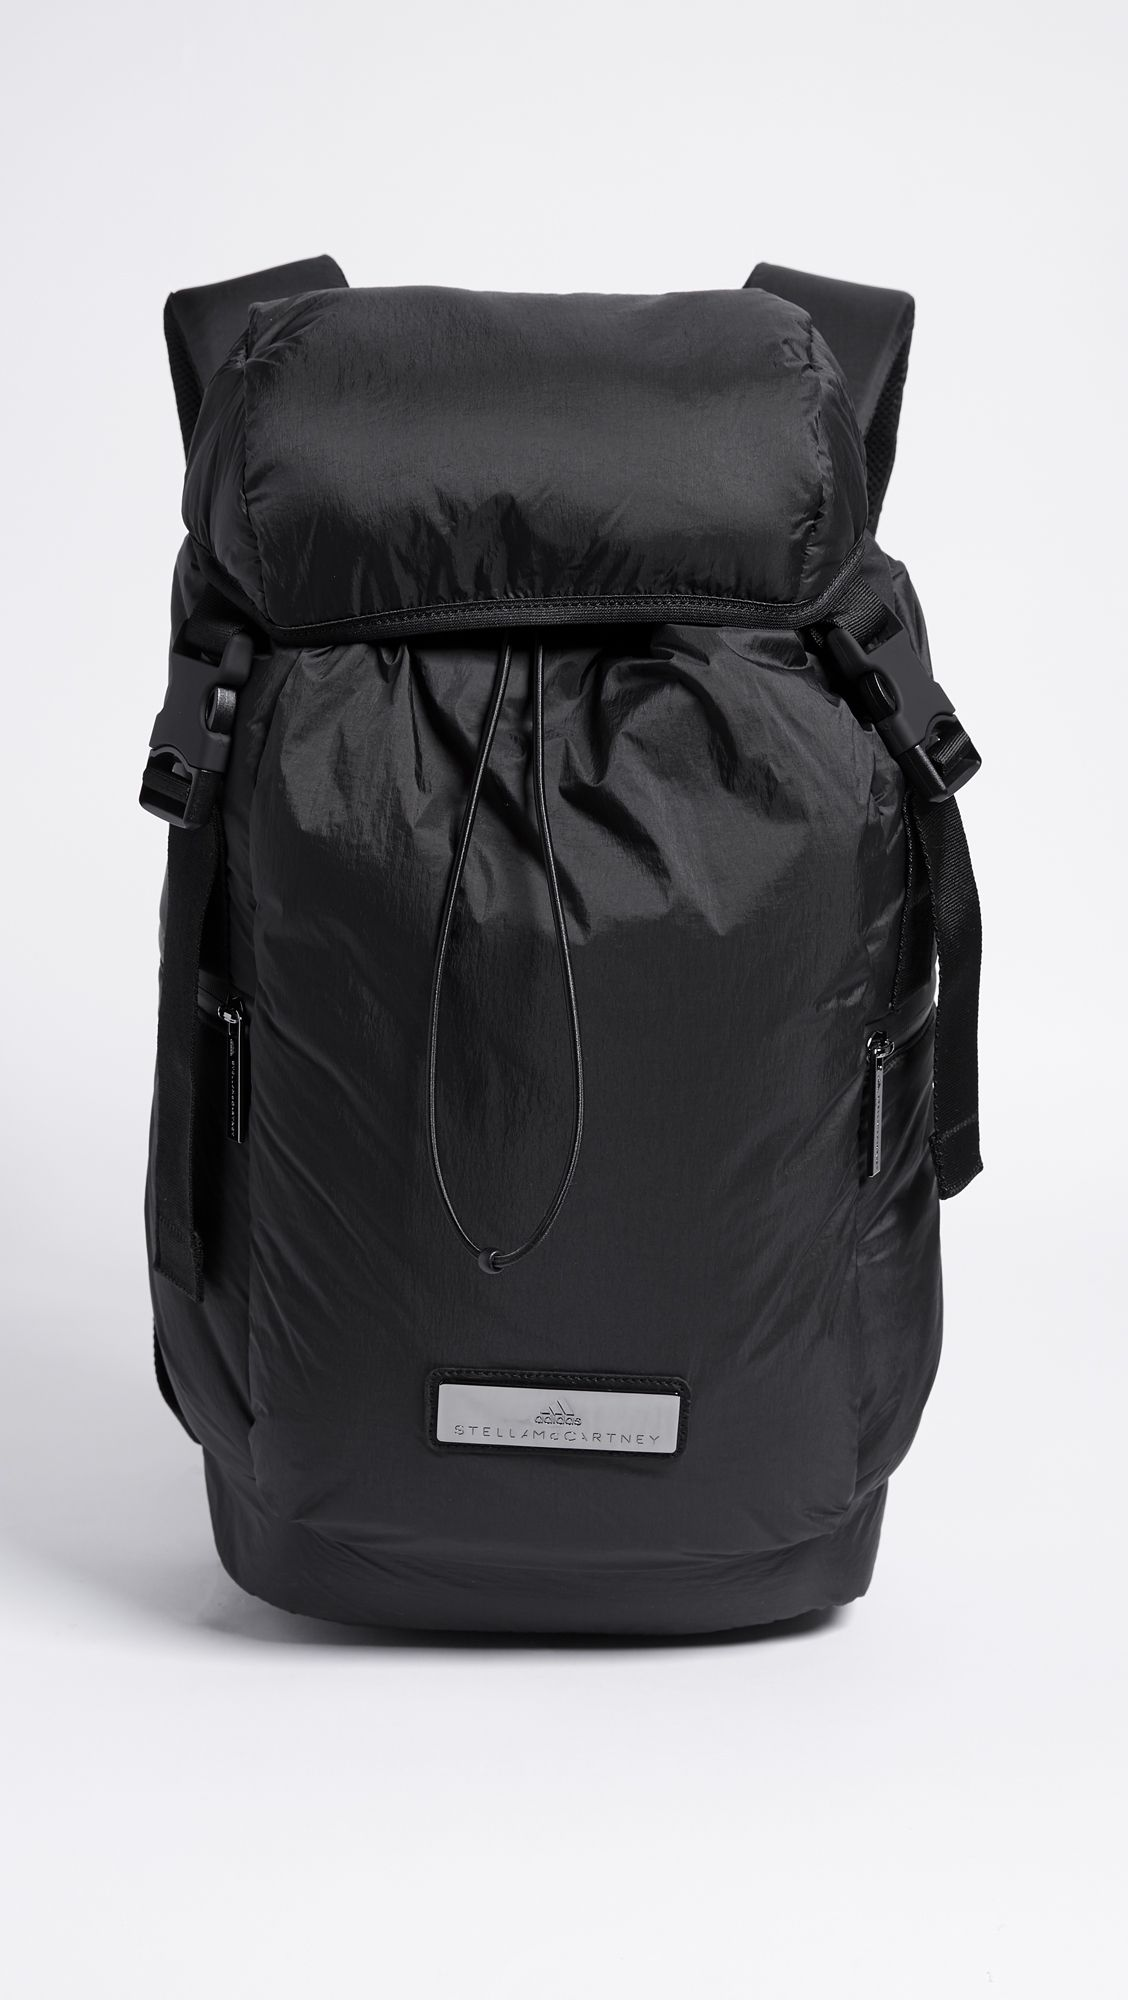 ADIDAS BY STELLA MCCARTNEY ATHLETICS BACKPACK.  adidasbystellamccartney   bags  nylon  backpacks   72d110646ab24